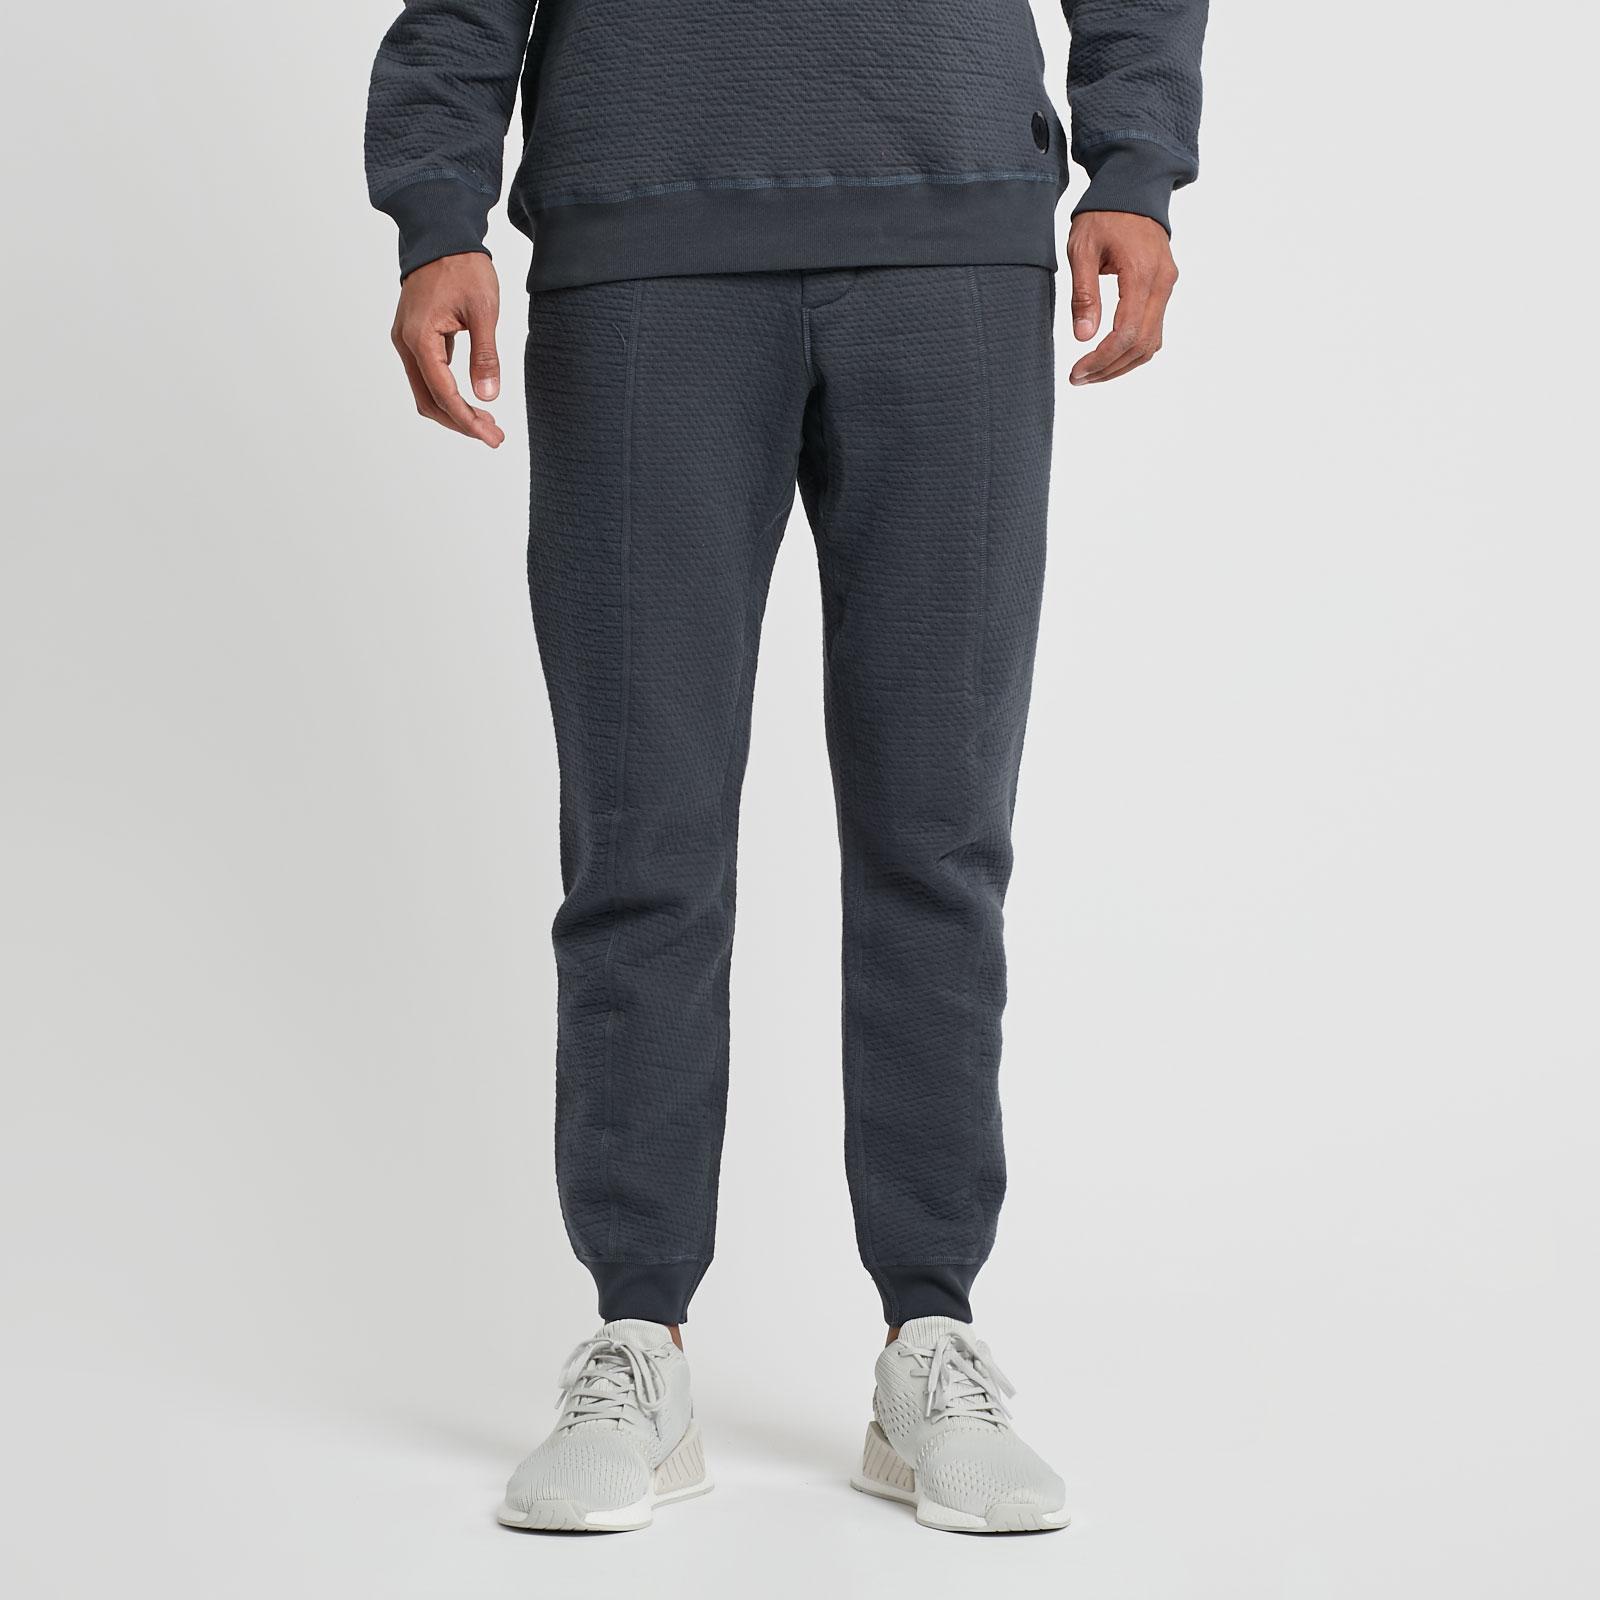 buy popular 3f19a f2c84 adidas x Wings+Horns Cabin Fleece Pants